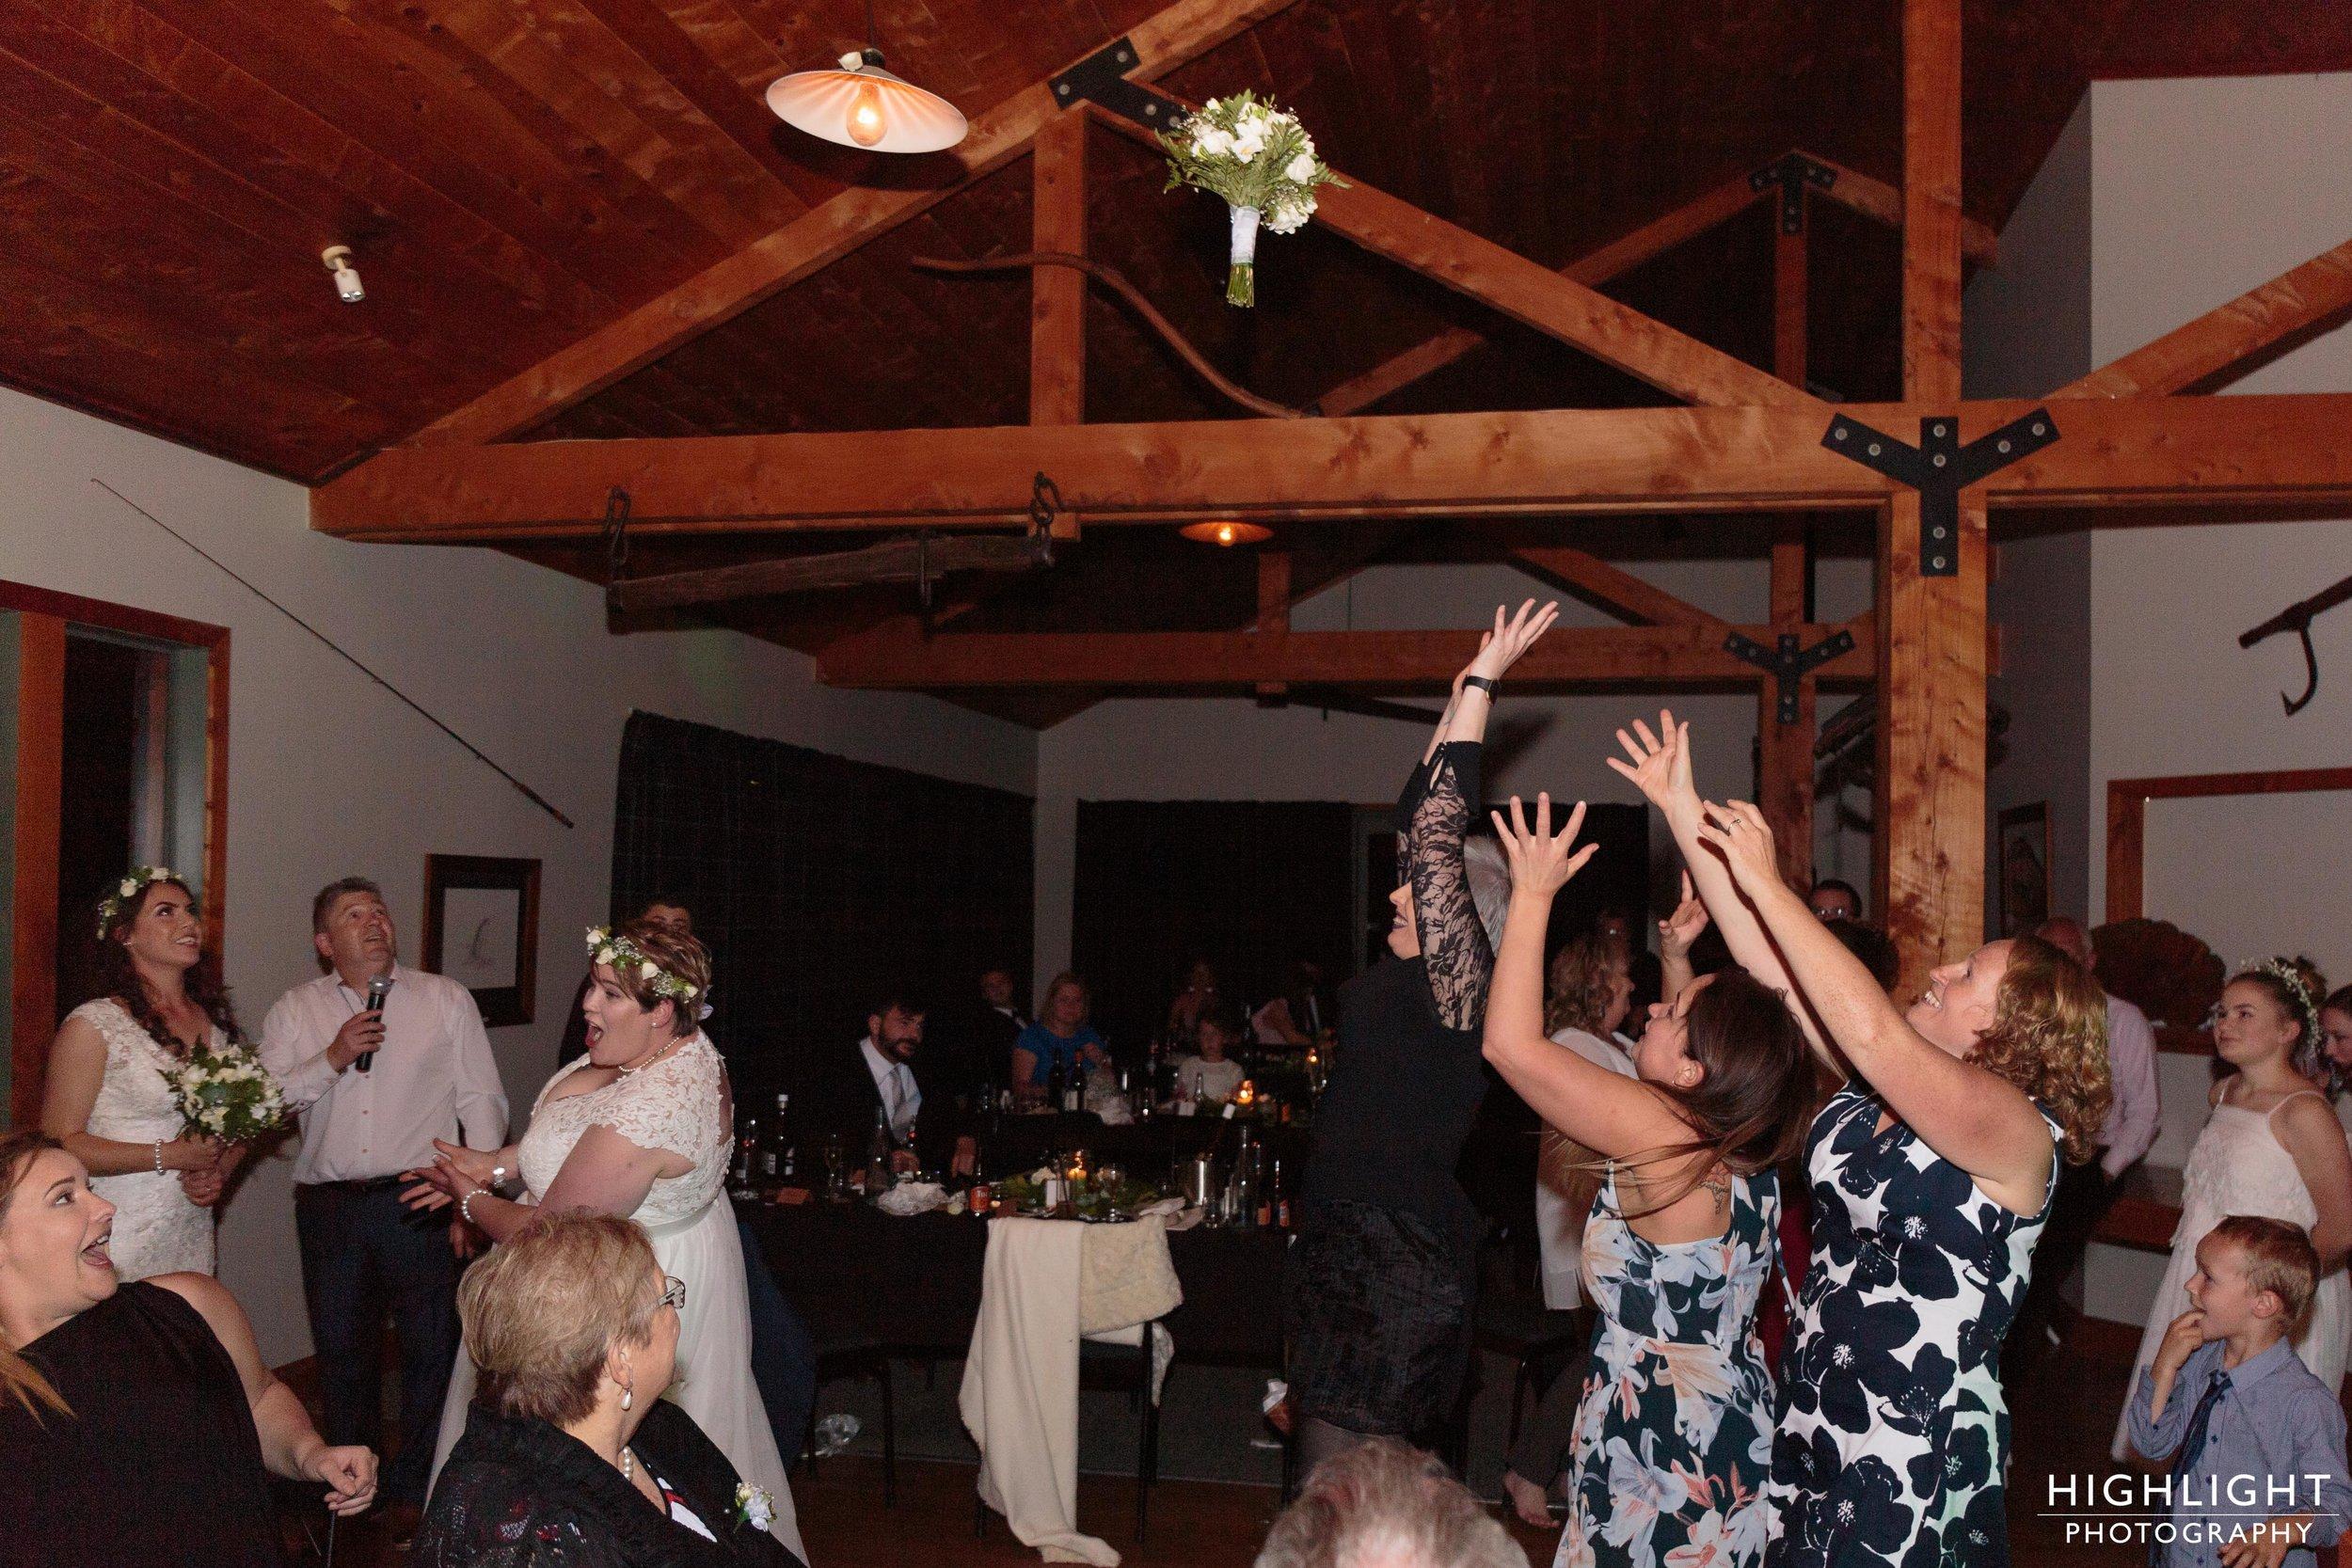 highlight_wedding_photography_makoura_lodge_manawatu_new_zealand-176.jpg